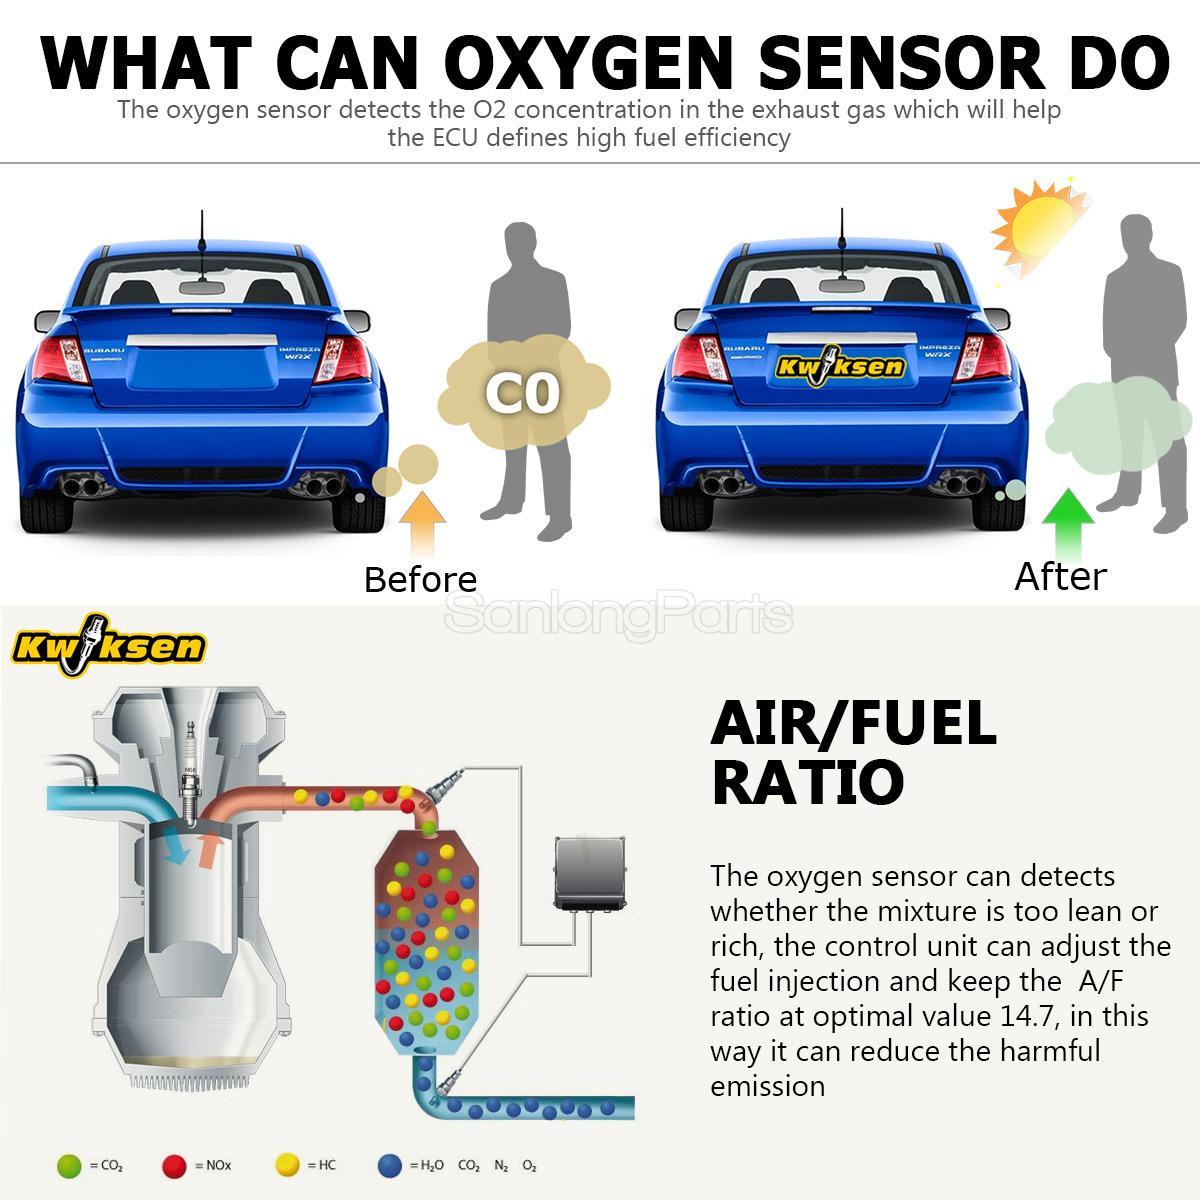 1997-2001 for Honda CR-V 1996-1997 for Honda Civic del Sol OCPTY 02 Oxygen Sensor SG336 234-4011 234-4123 234-4659 Upstream Downstream fit 1996-2000 for Honda Civic